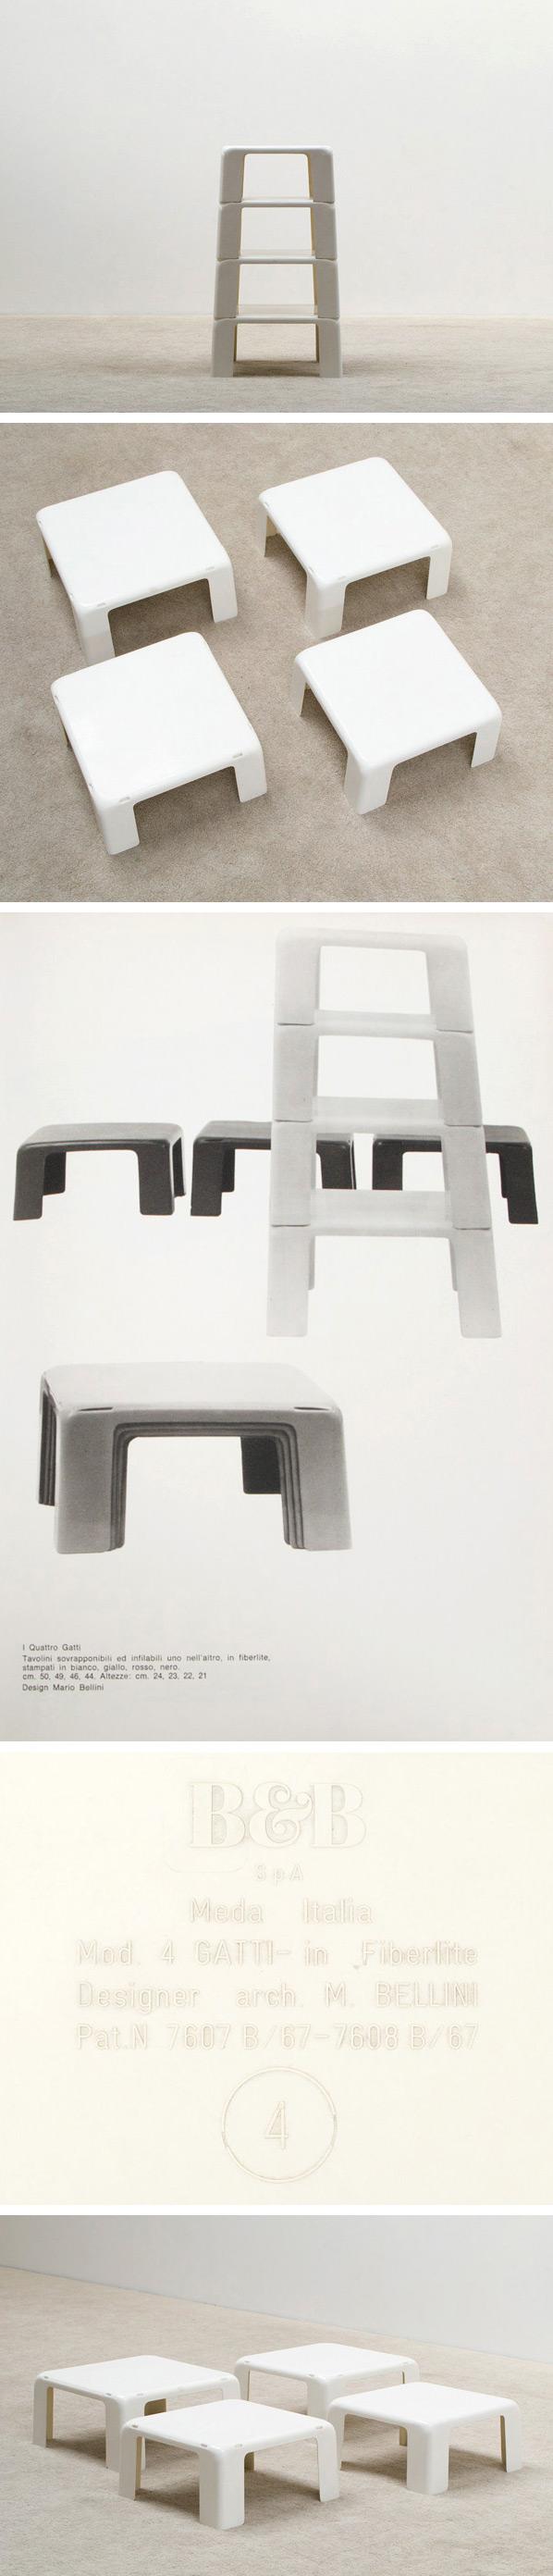 Mario Bellini Quattro Gatti Nesting tables Large